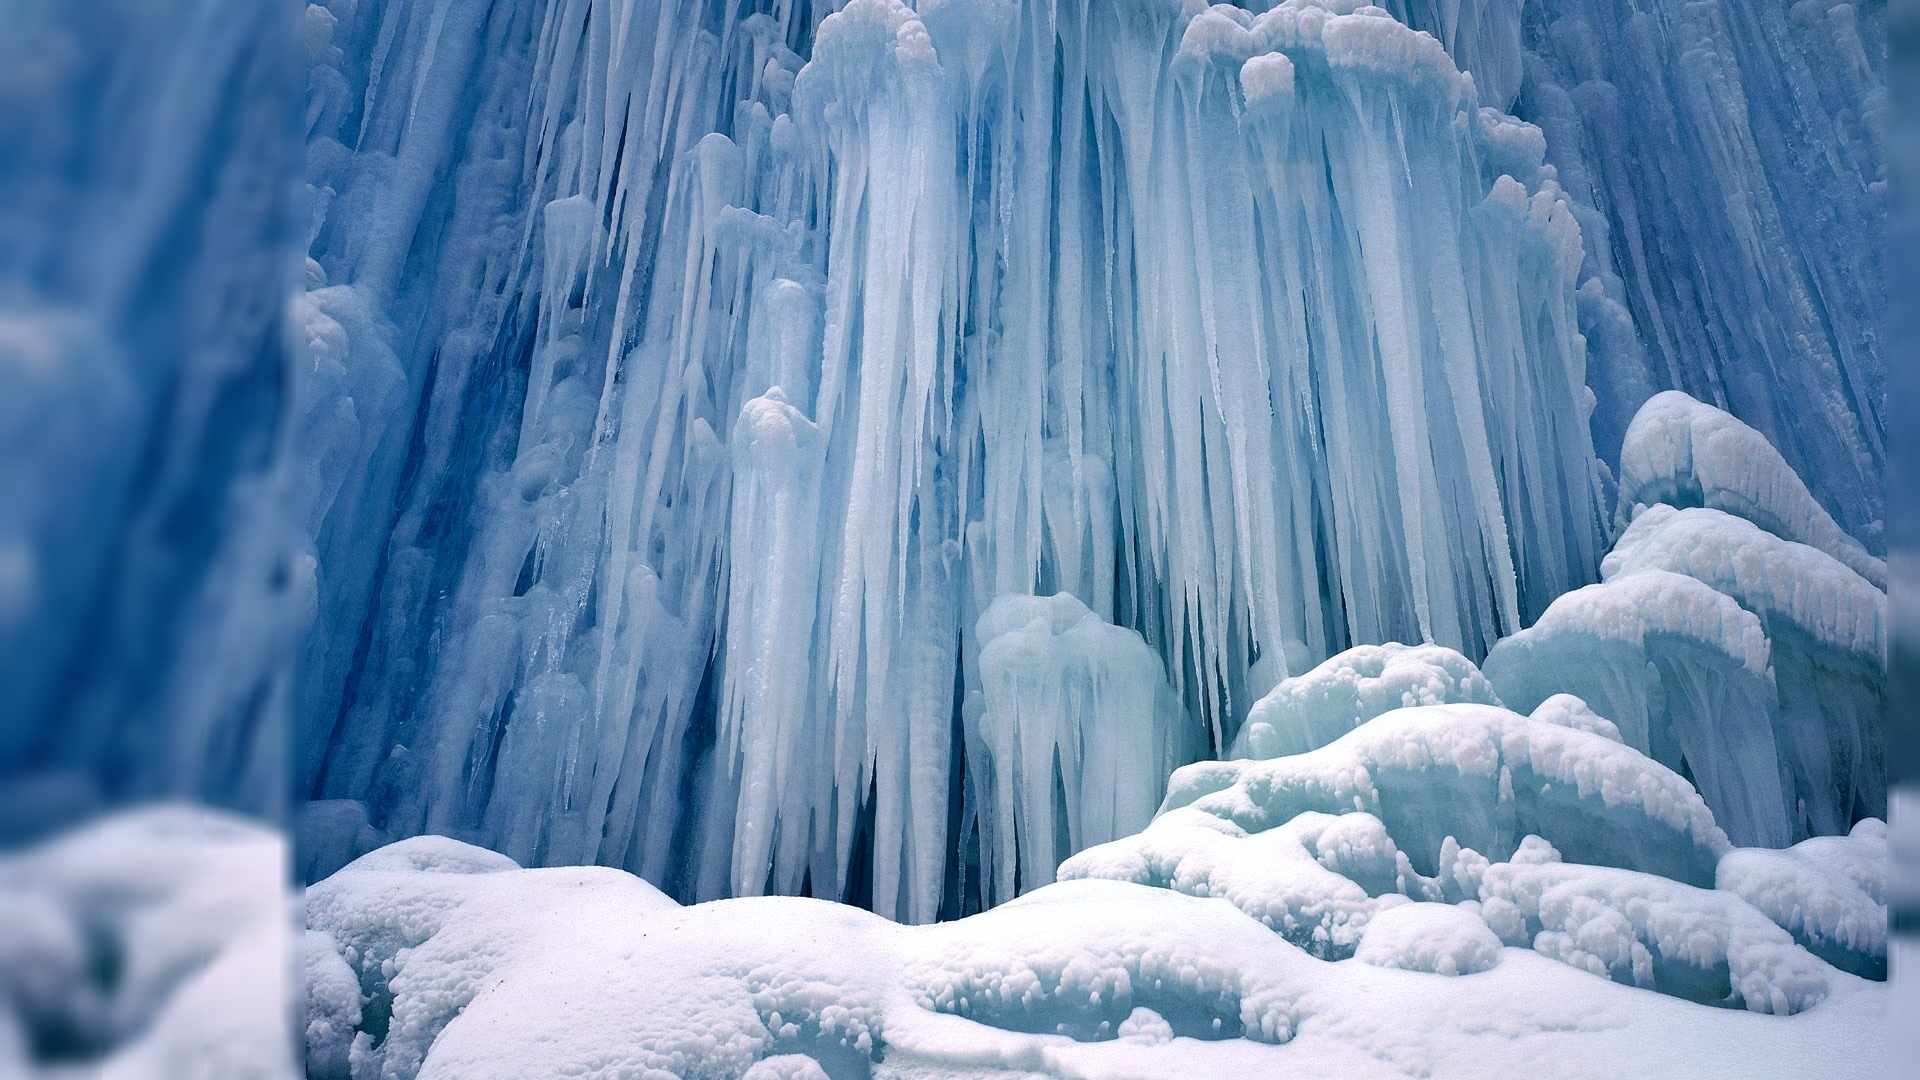 download desktop winter wallpaper which is under the winter 1920x1080